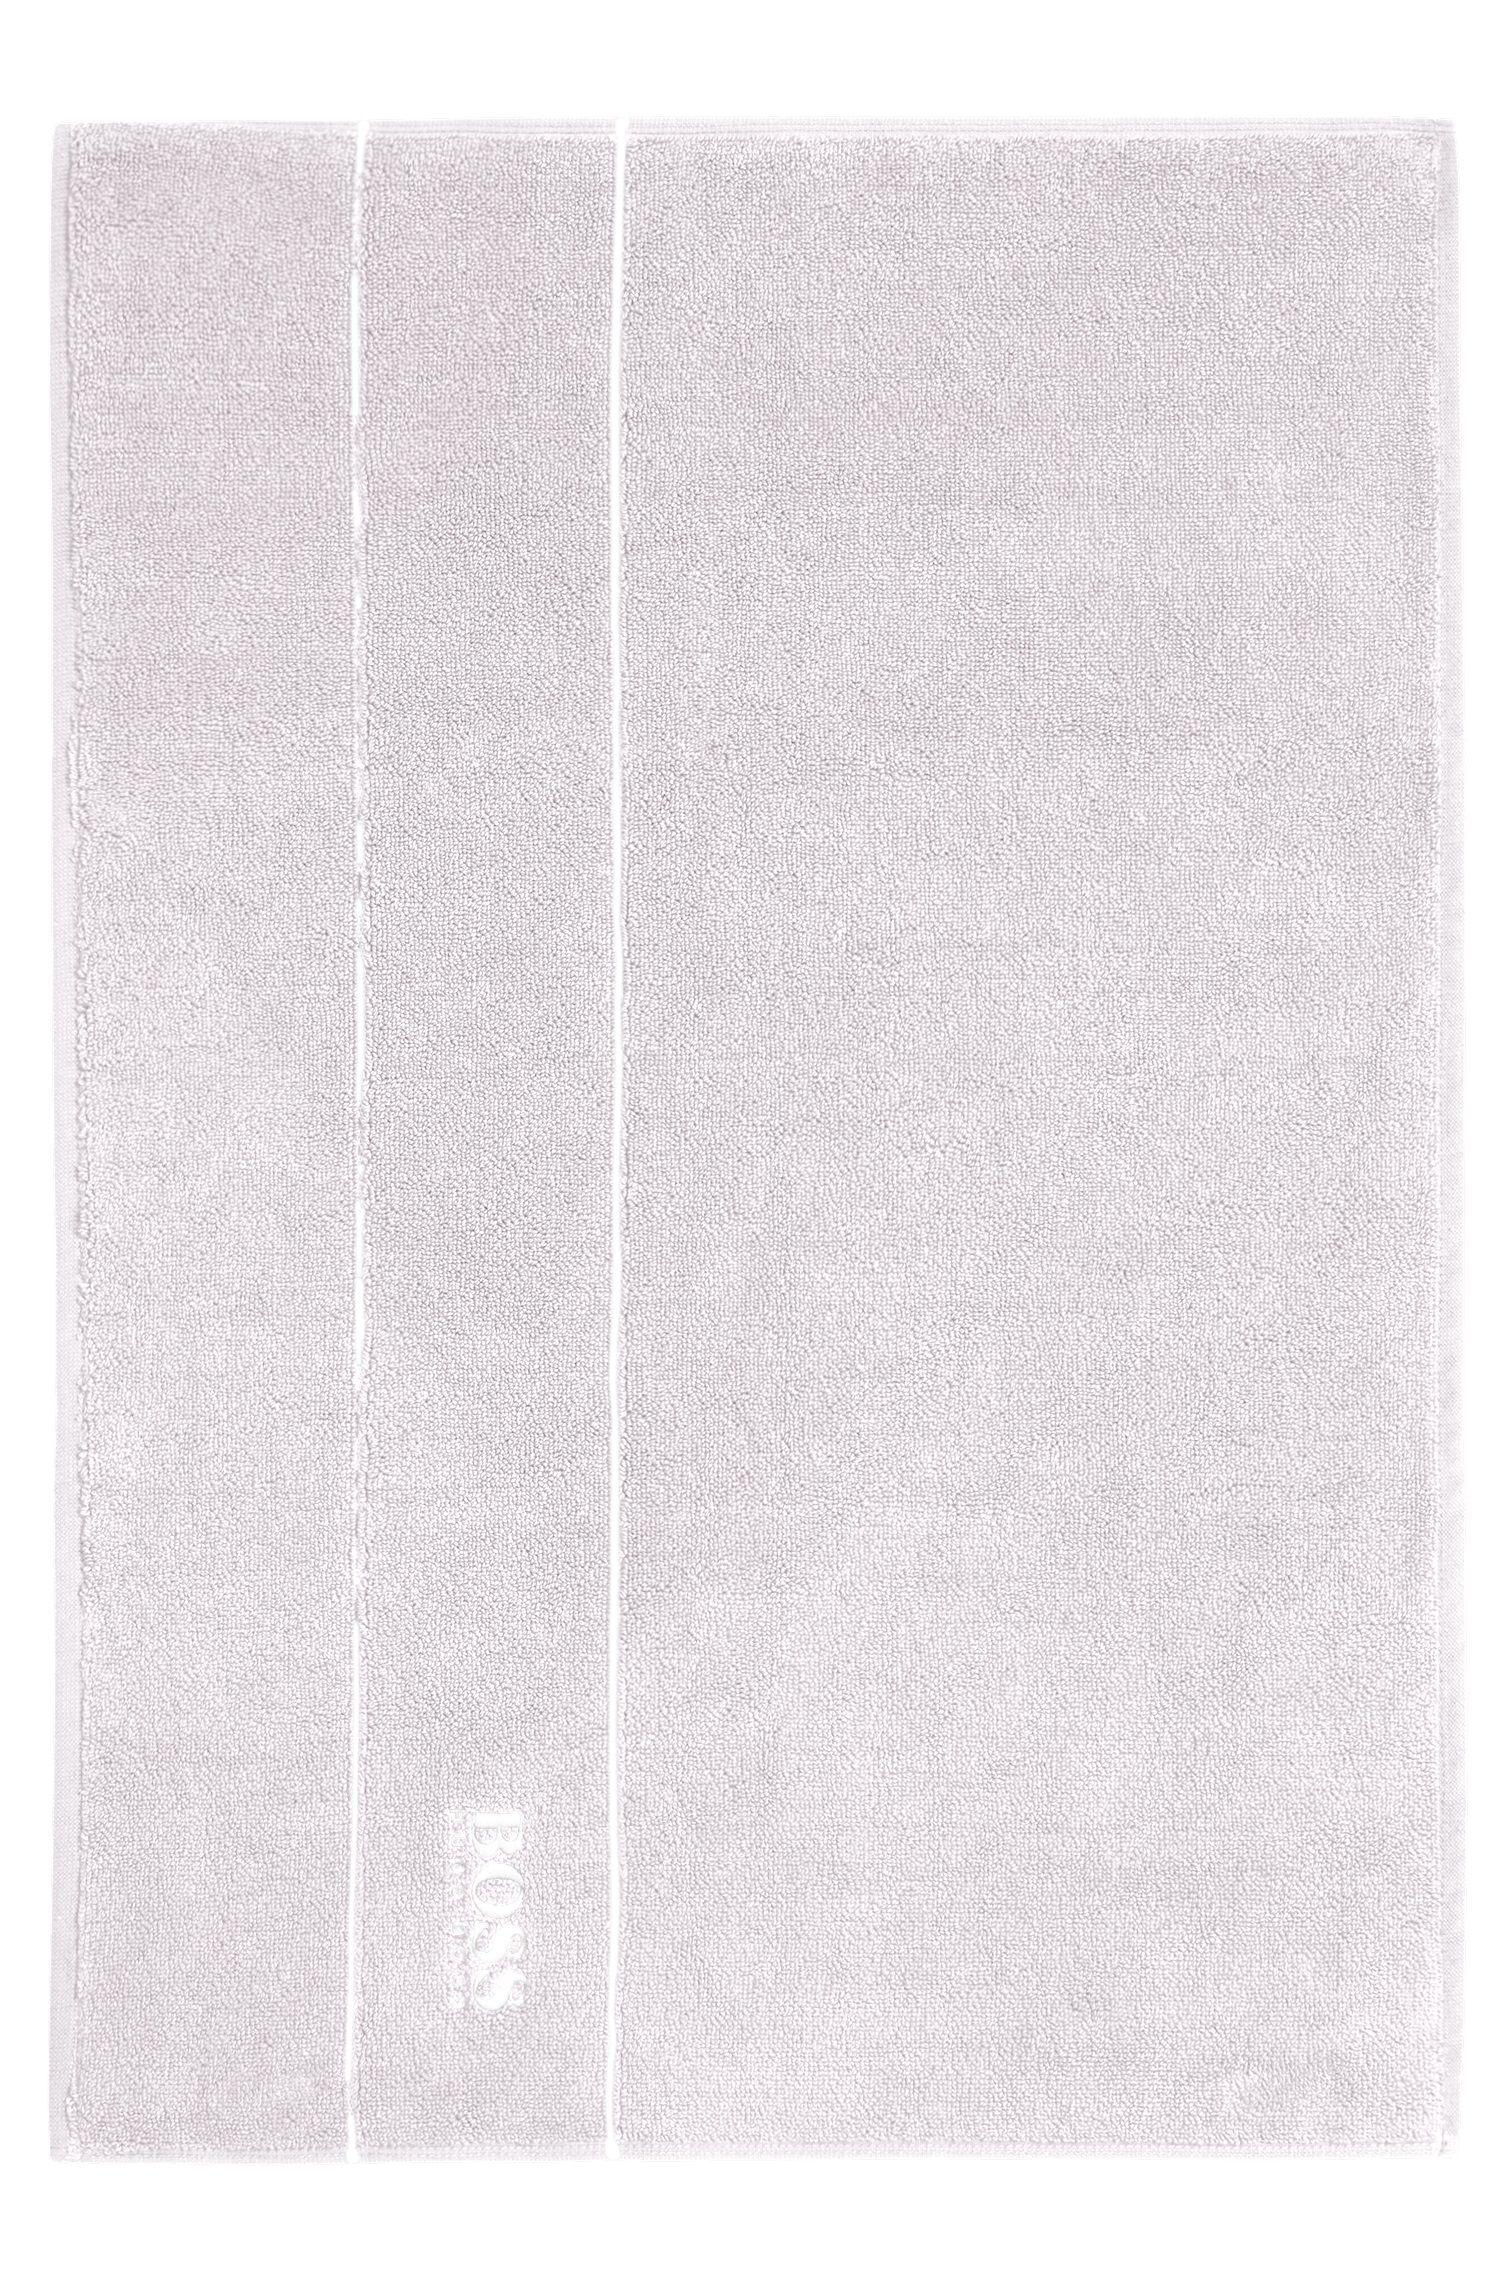 Alfombrilla de baño 'PLAIN Tapis de bain' en rizo de algodón